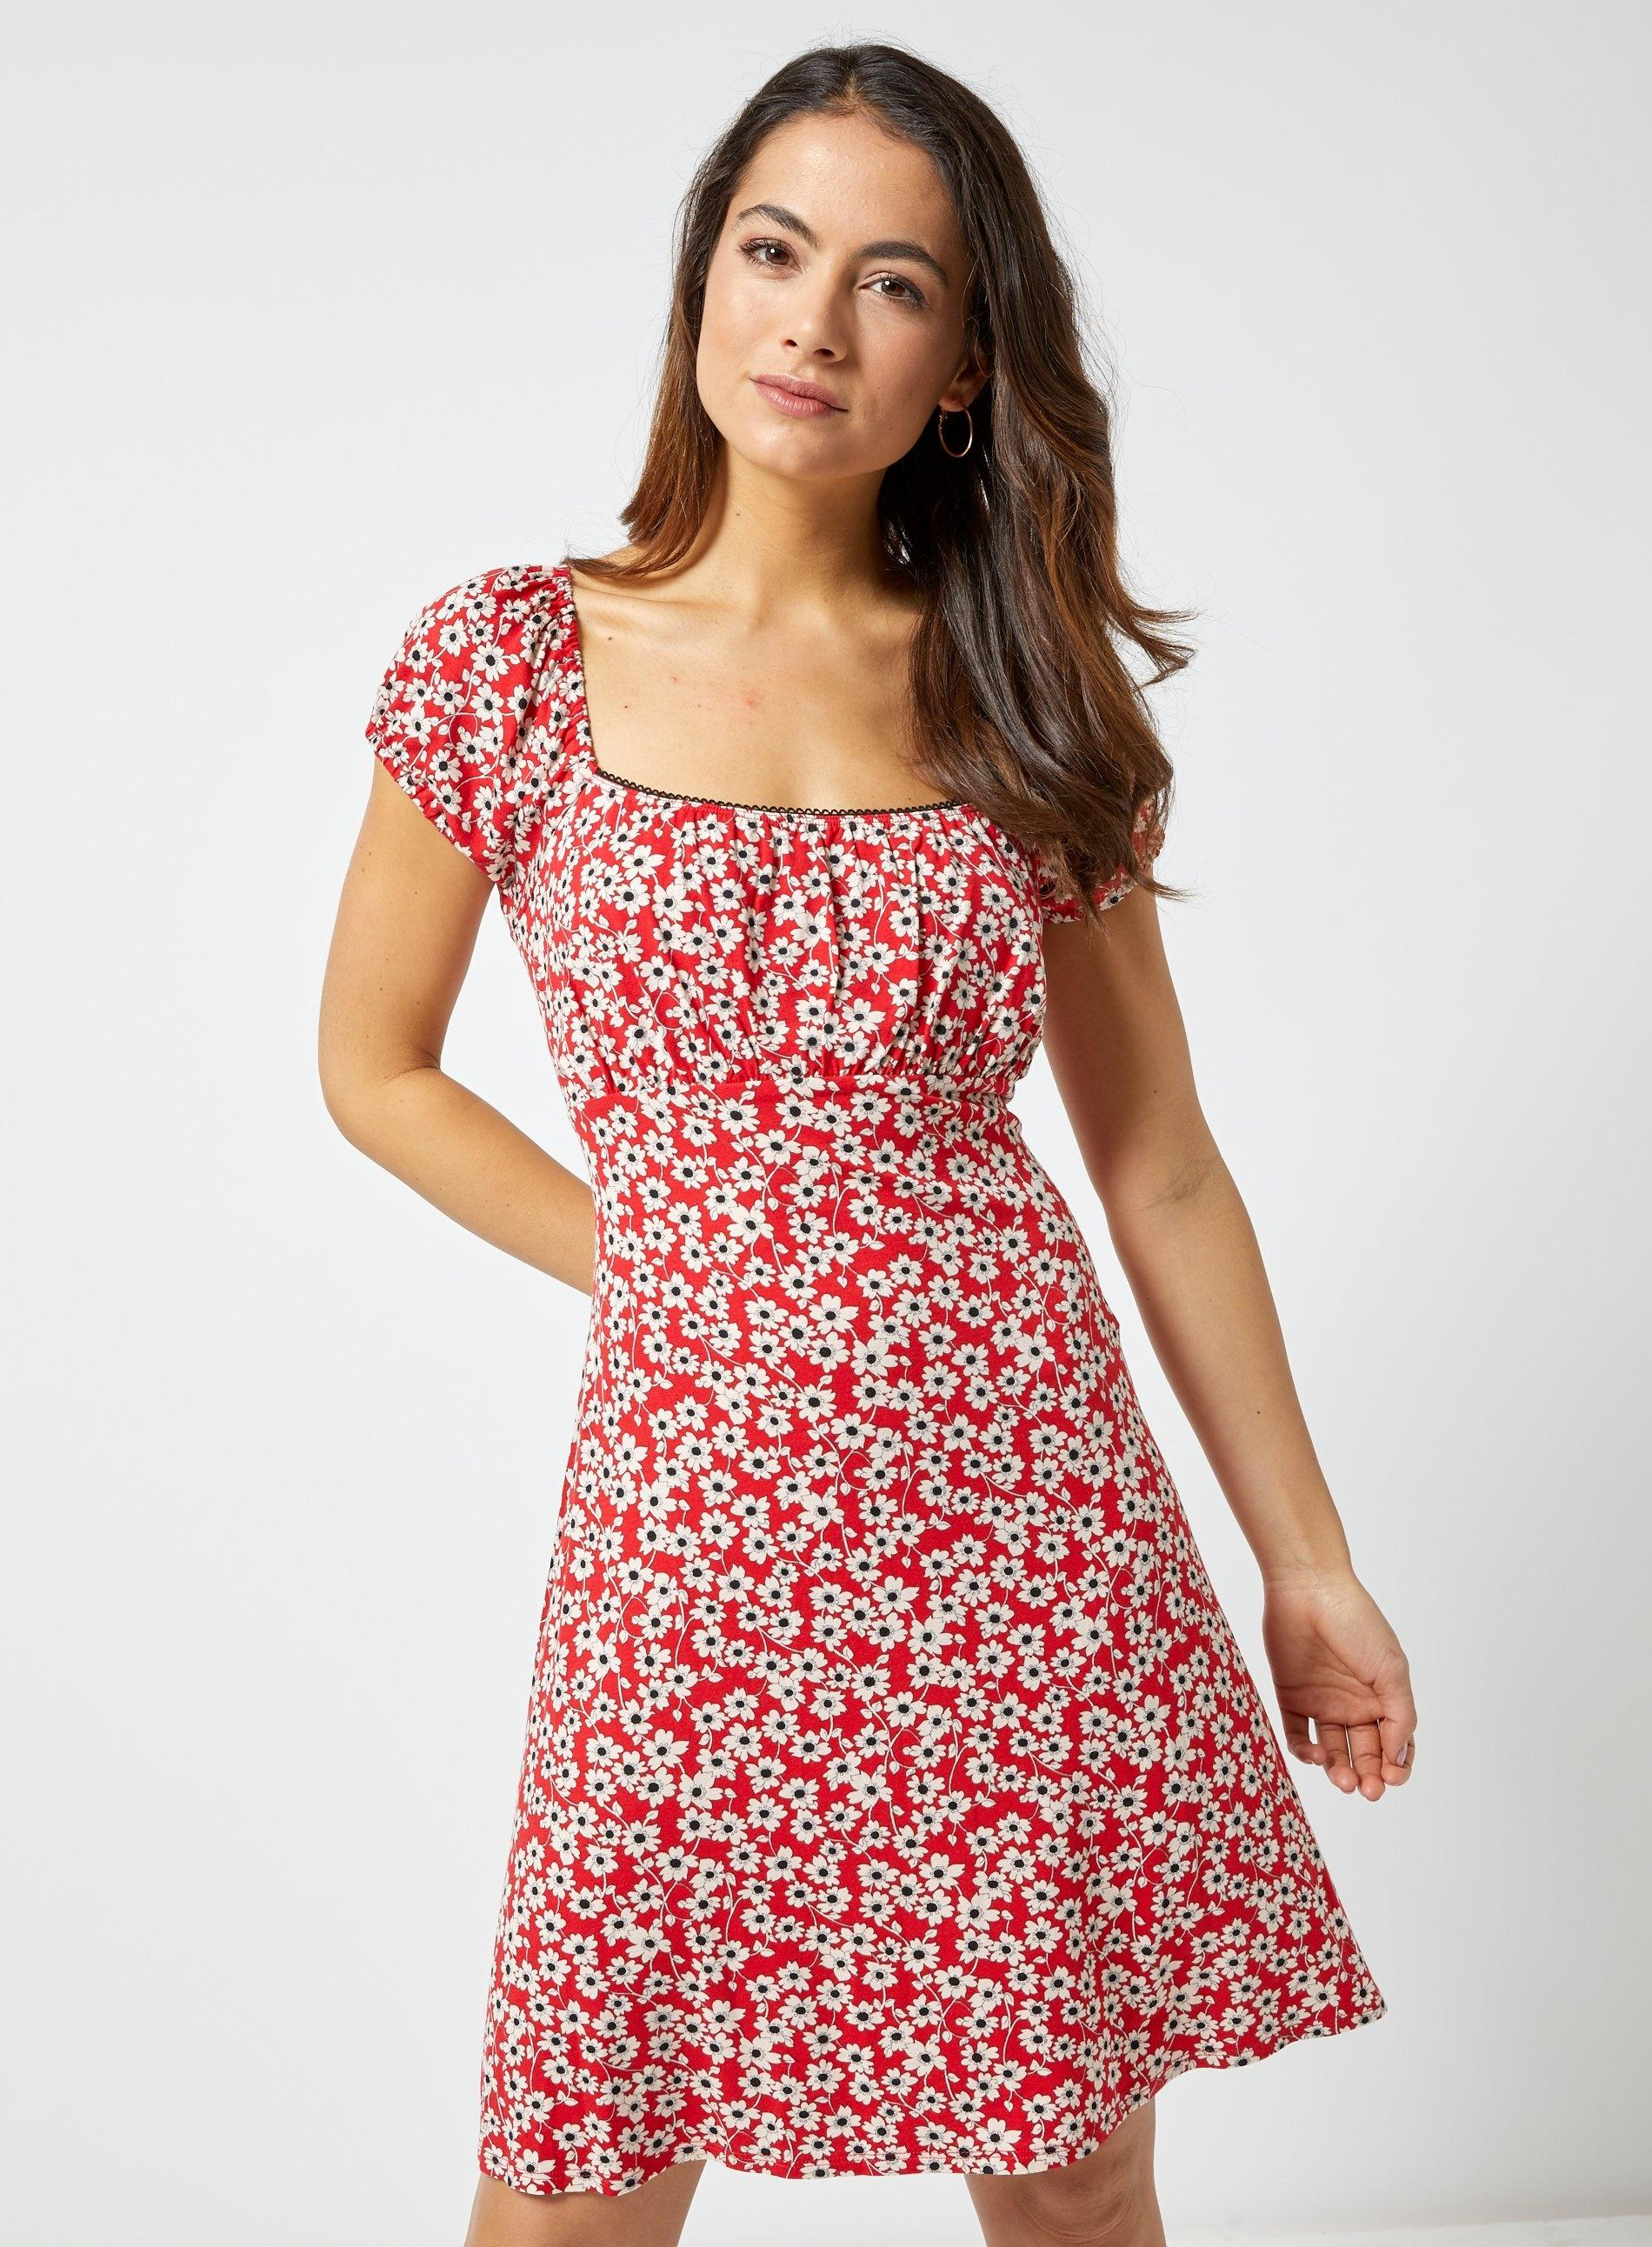 cfbbd0a18f6 Dorothy Perkins - Petite Red Ditsy Print Dress - Lyst. View fullscreen